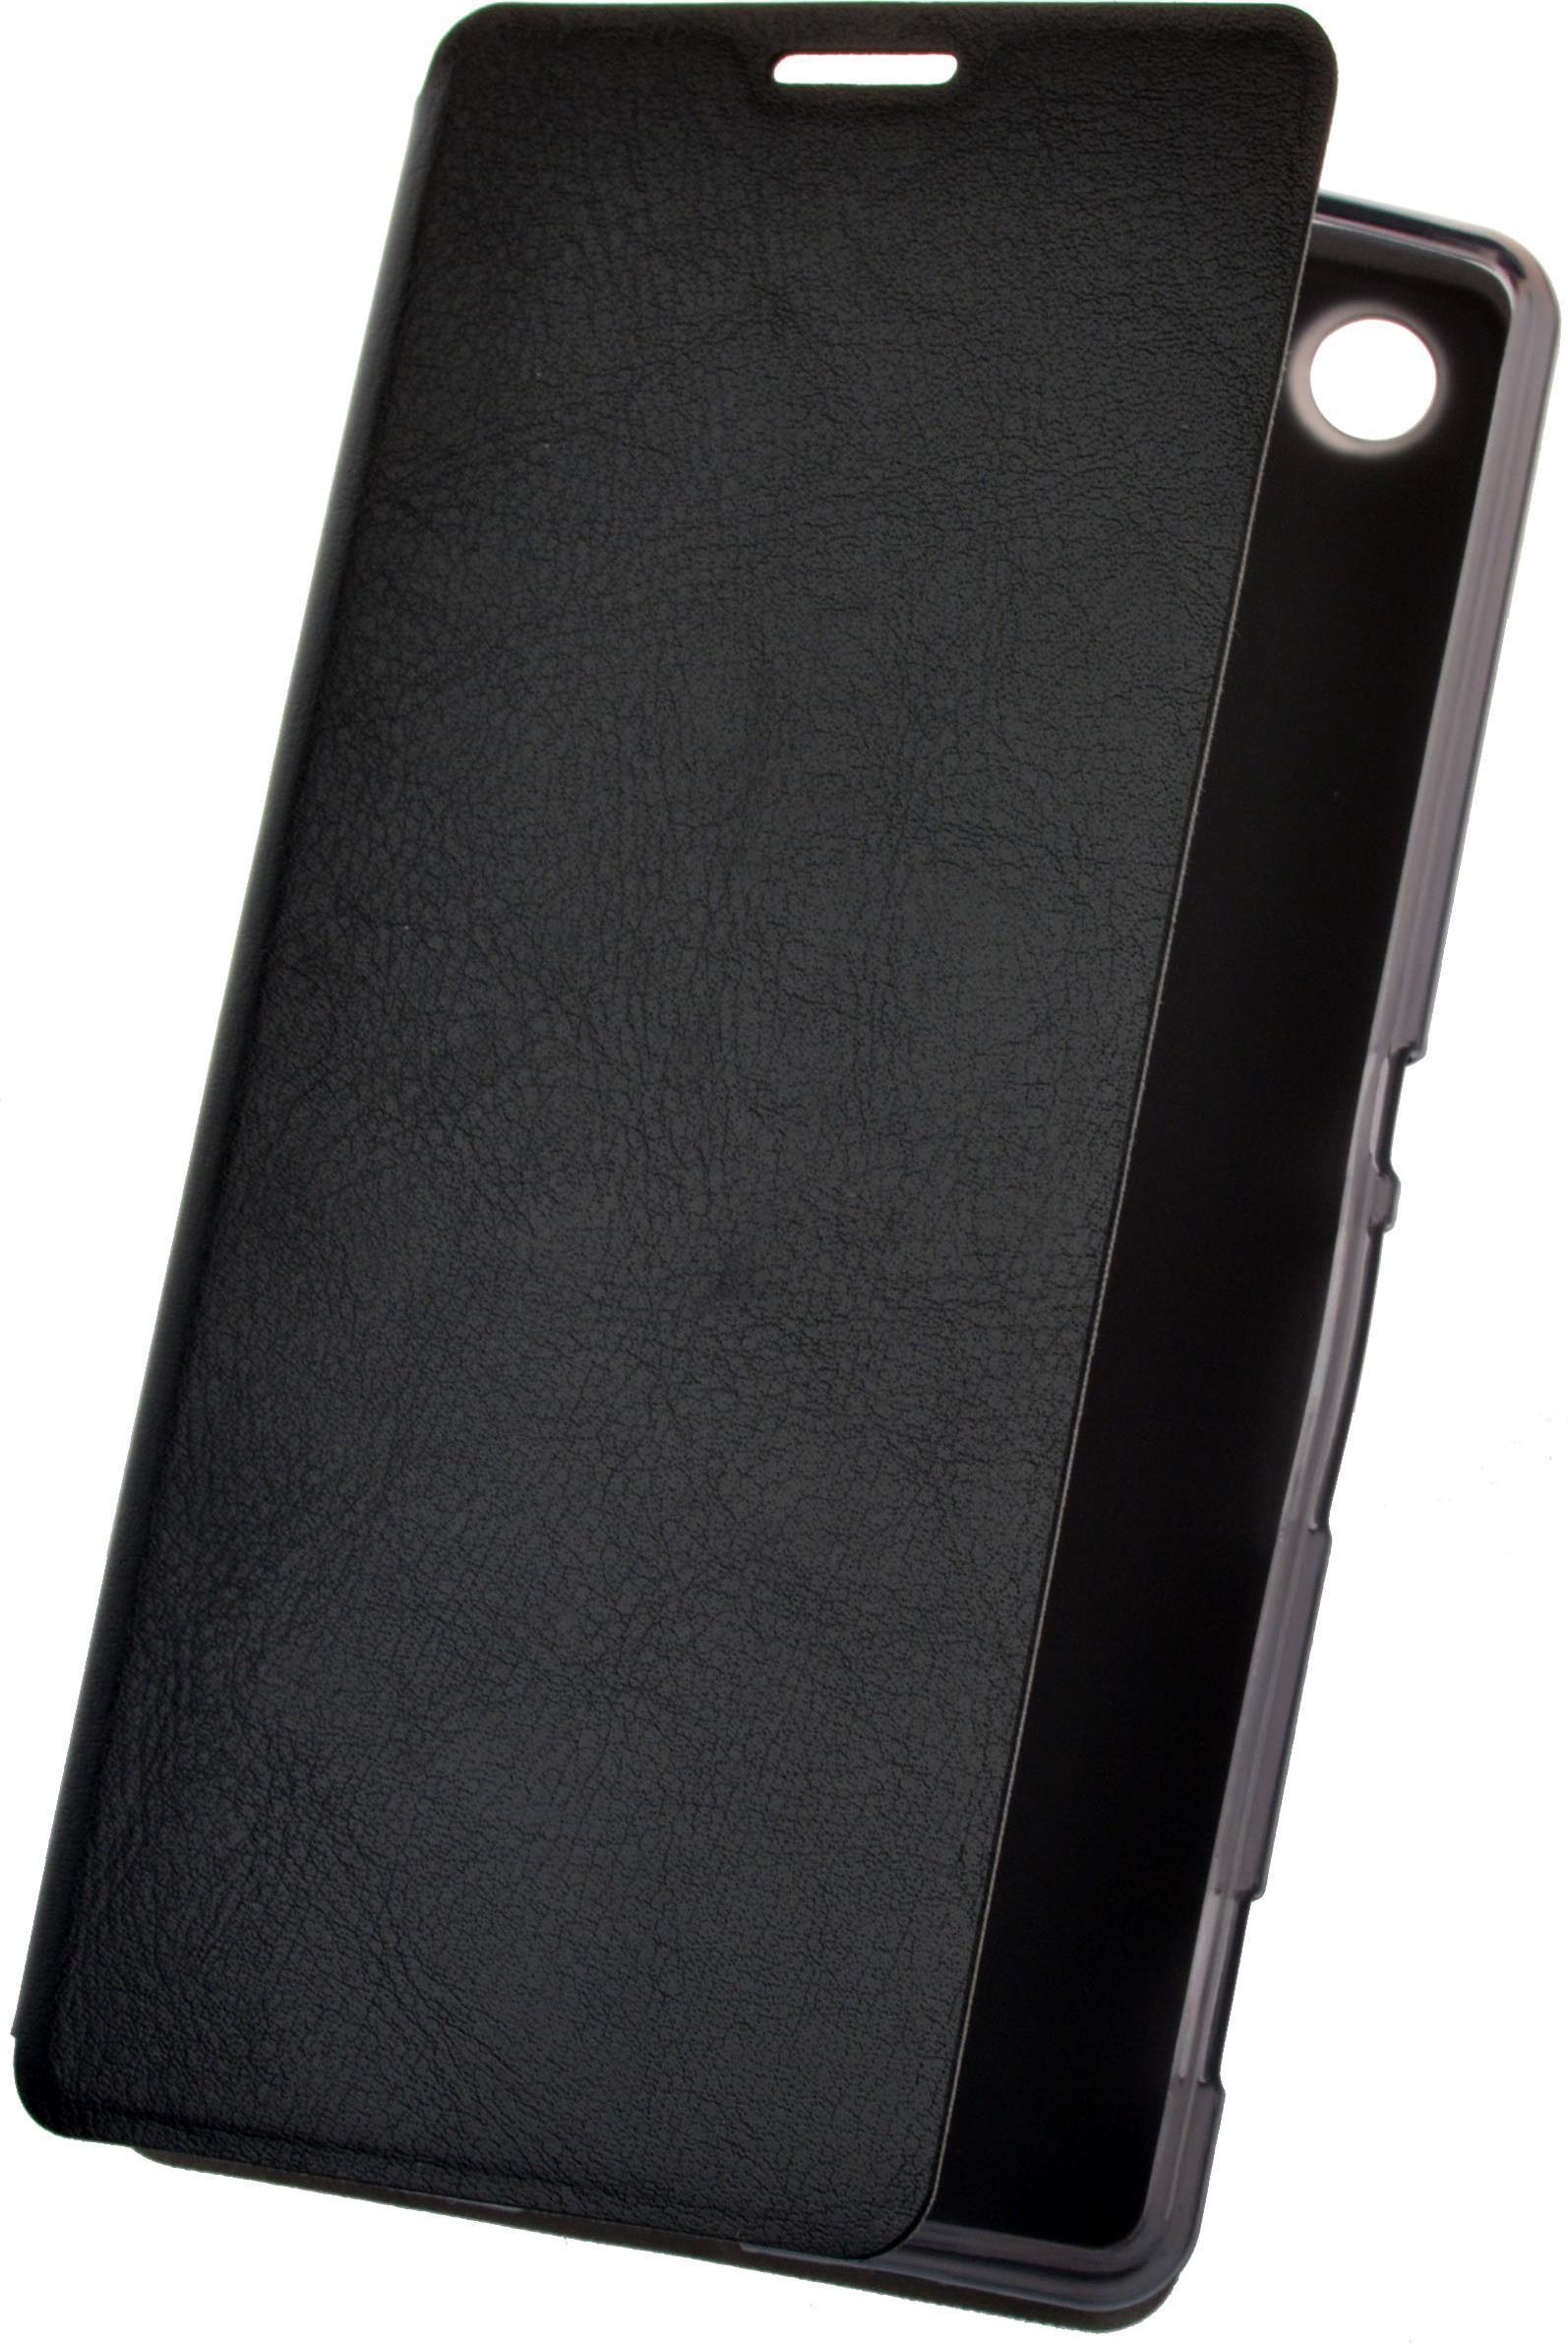 Чехол SkinBox Lux для Sony E5603 Xperia M5, черный